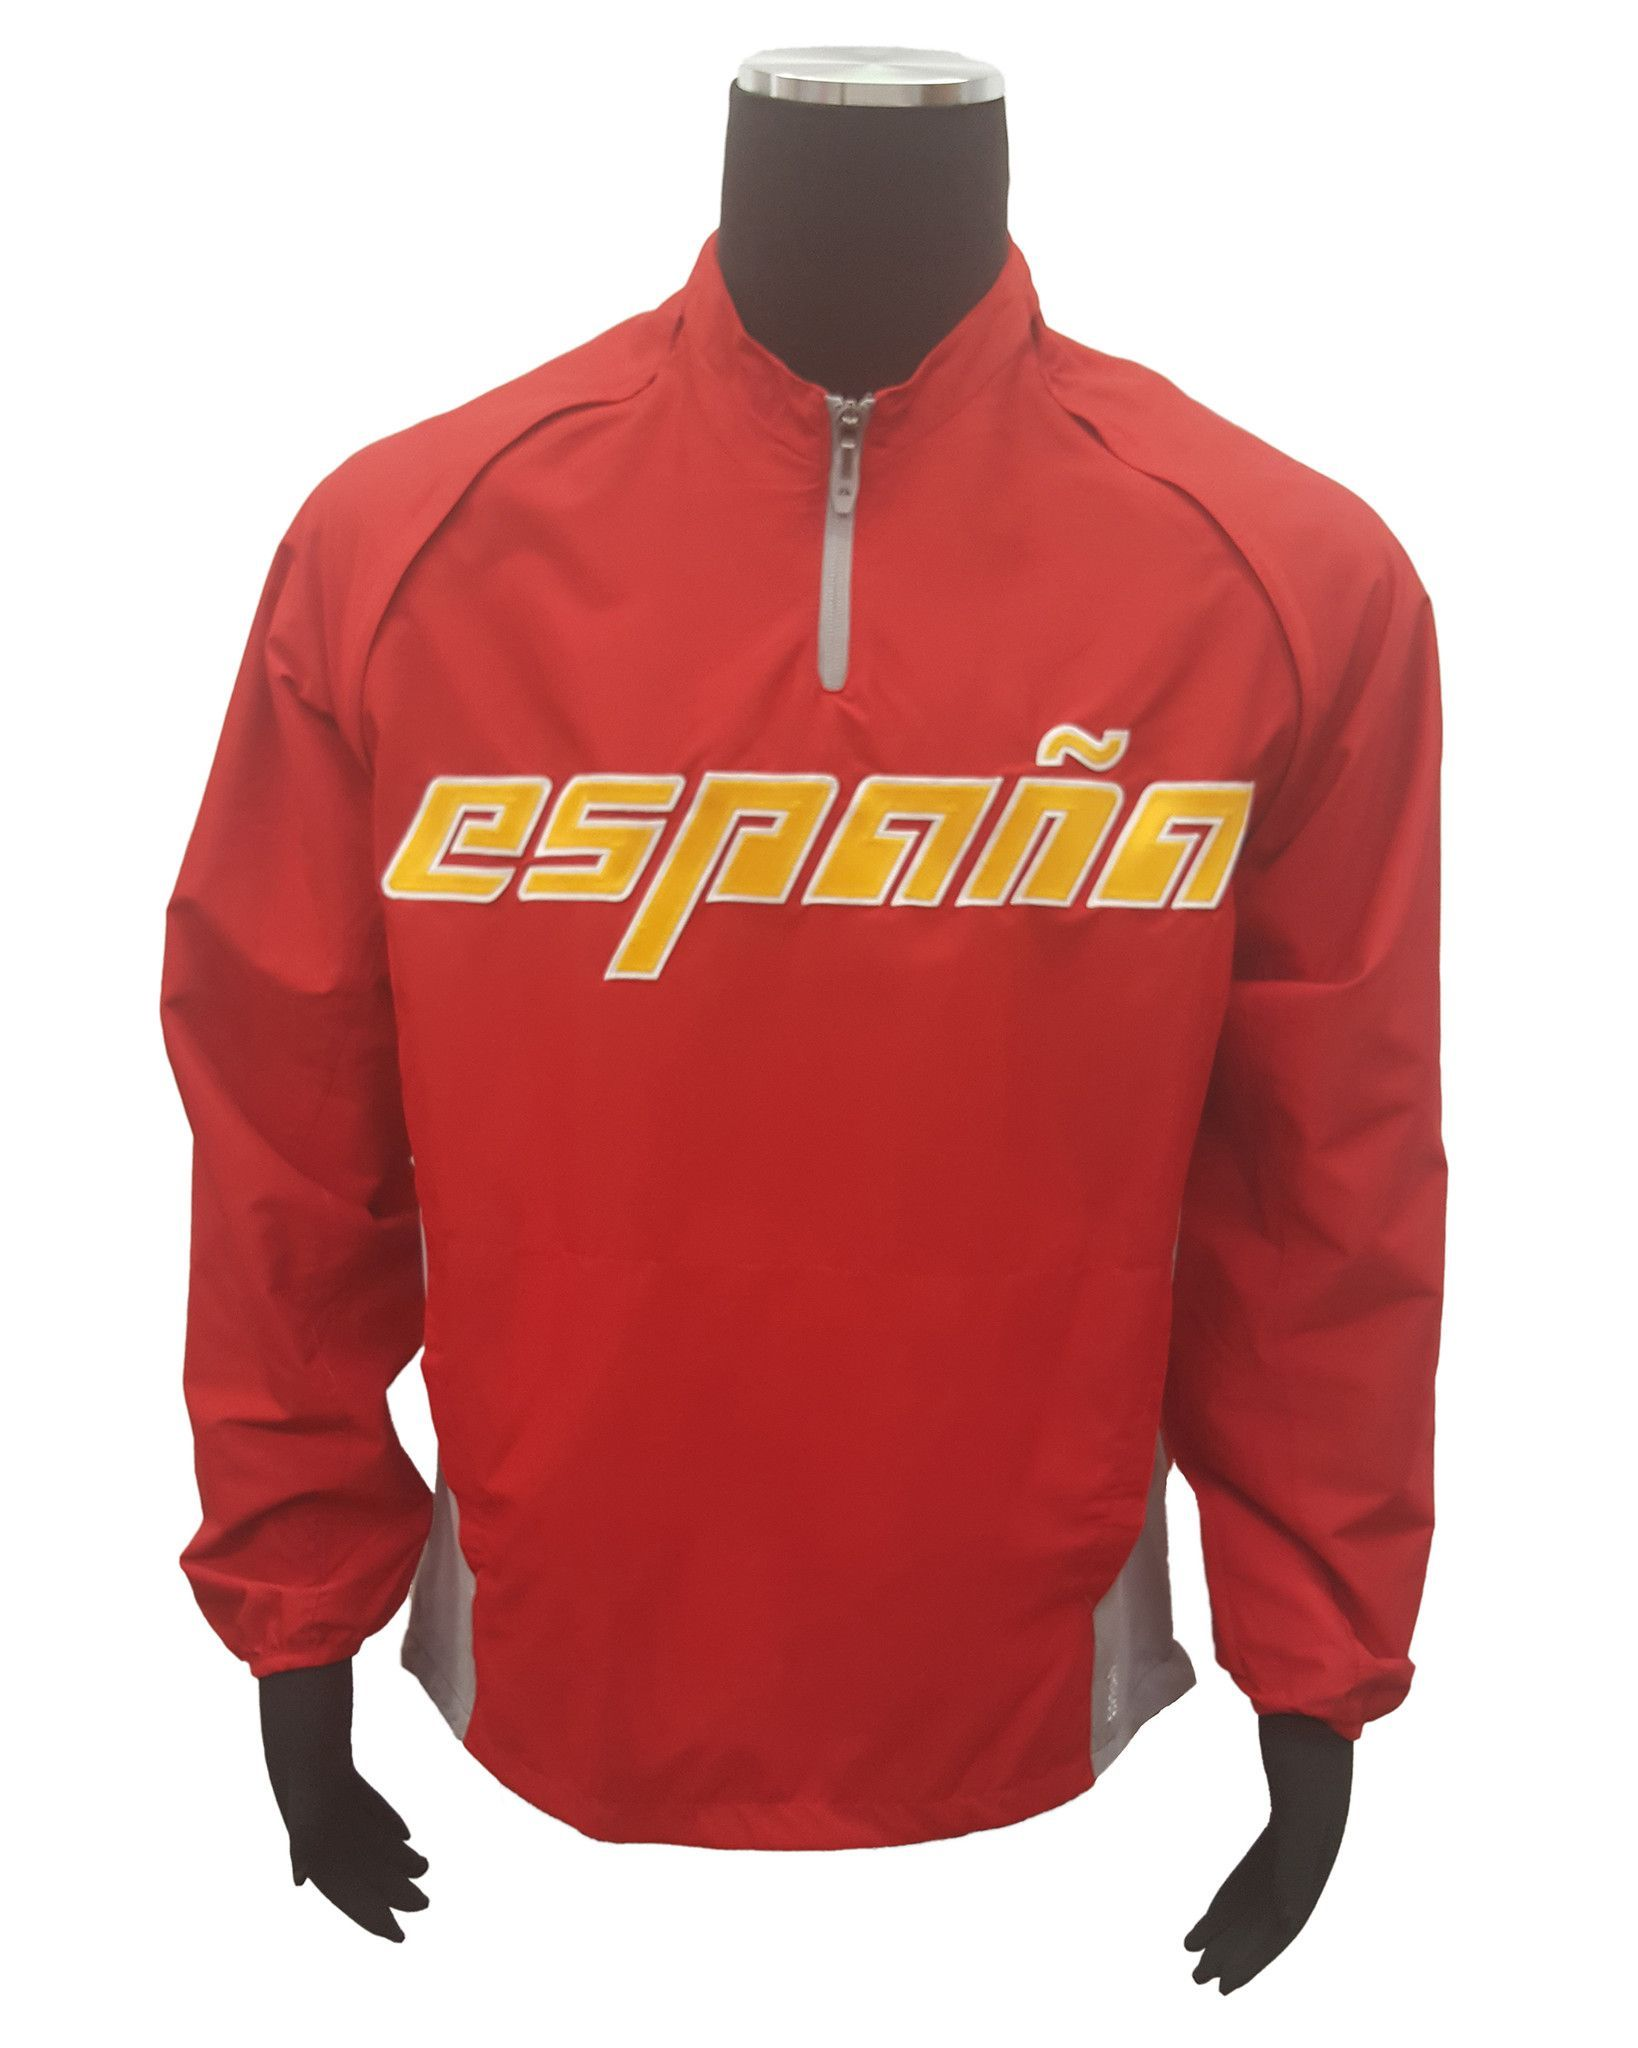 Majestic Spain Espana WBC Authentic Triple Peak Cool Base Gamer Jacket